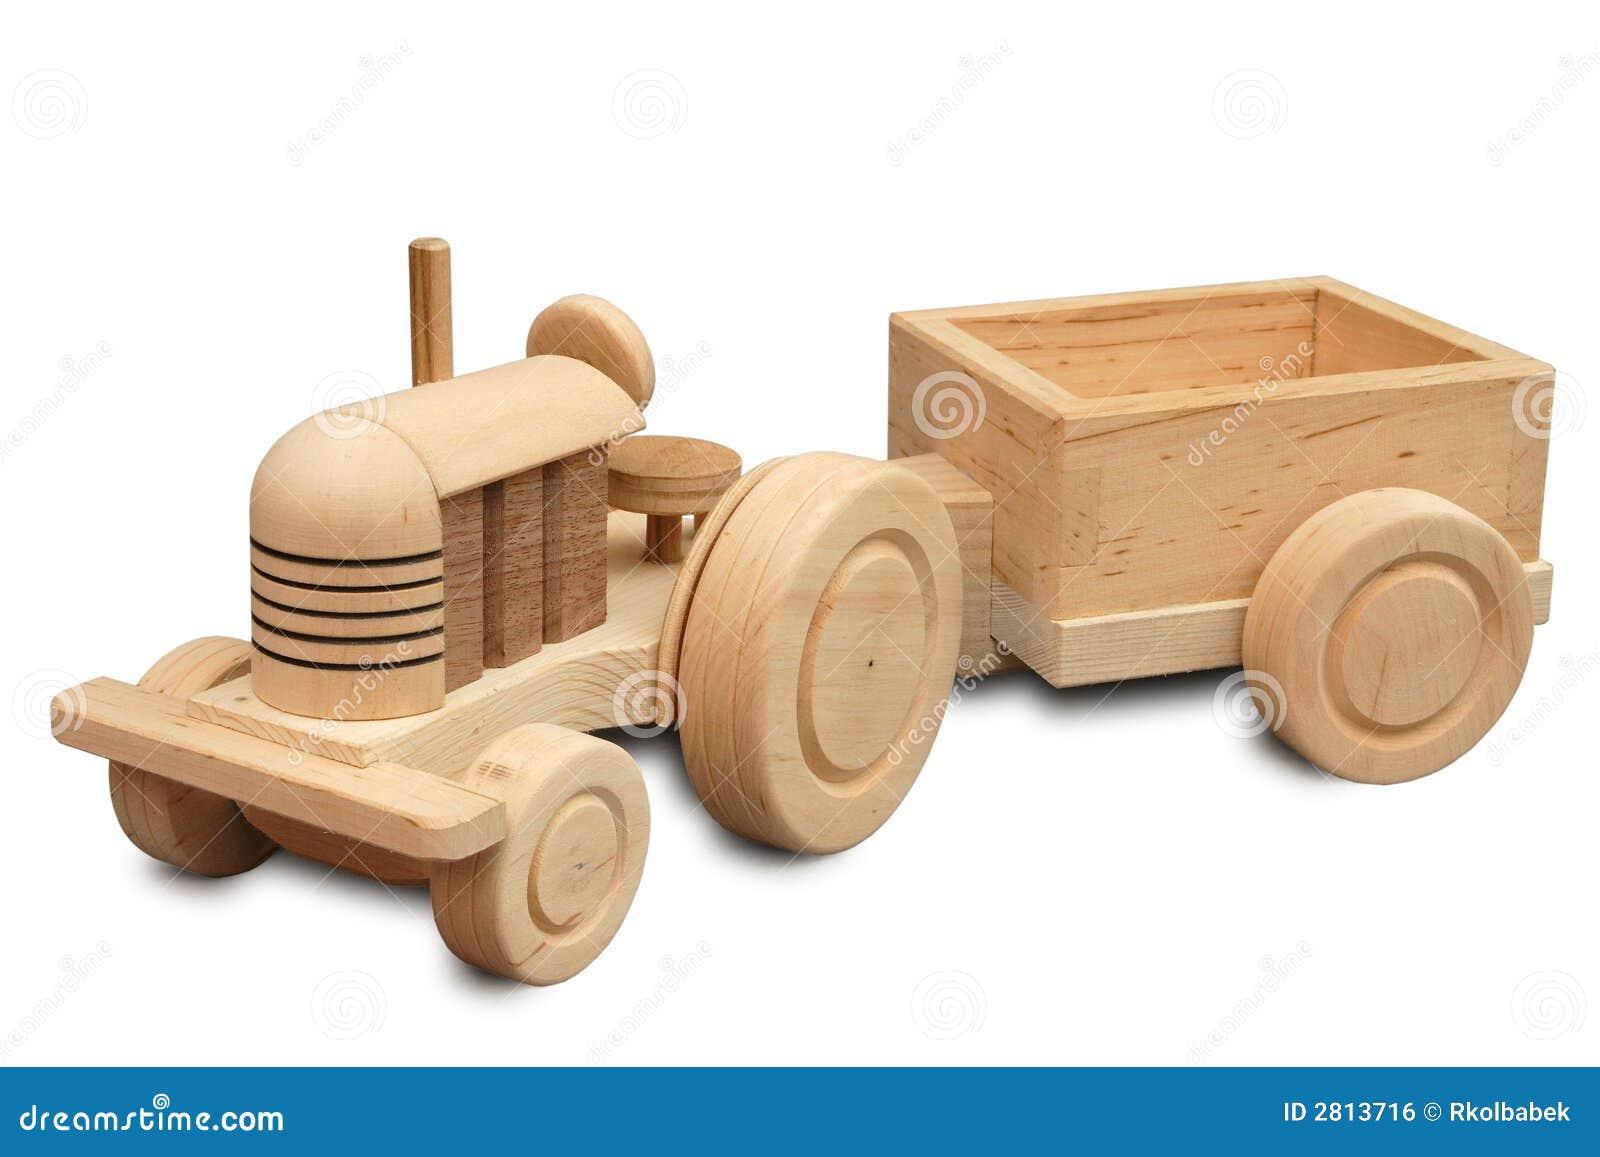 Juguete de madera imagen de archivo libre de regal as - Jugueteros de madera ...